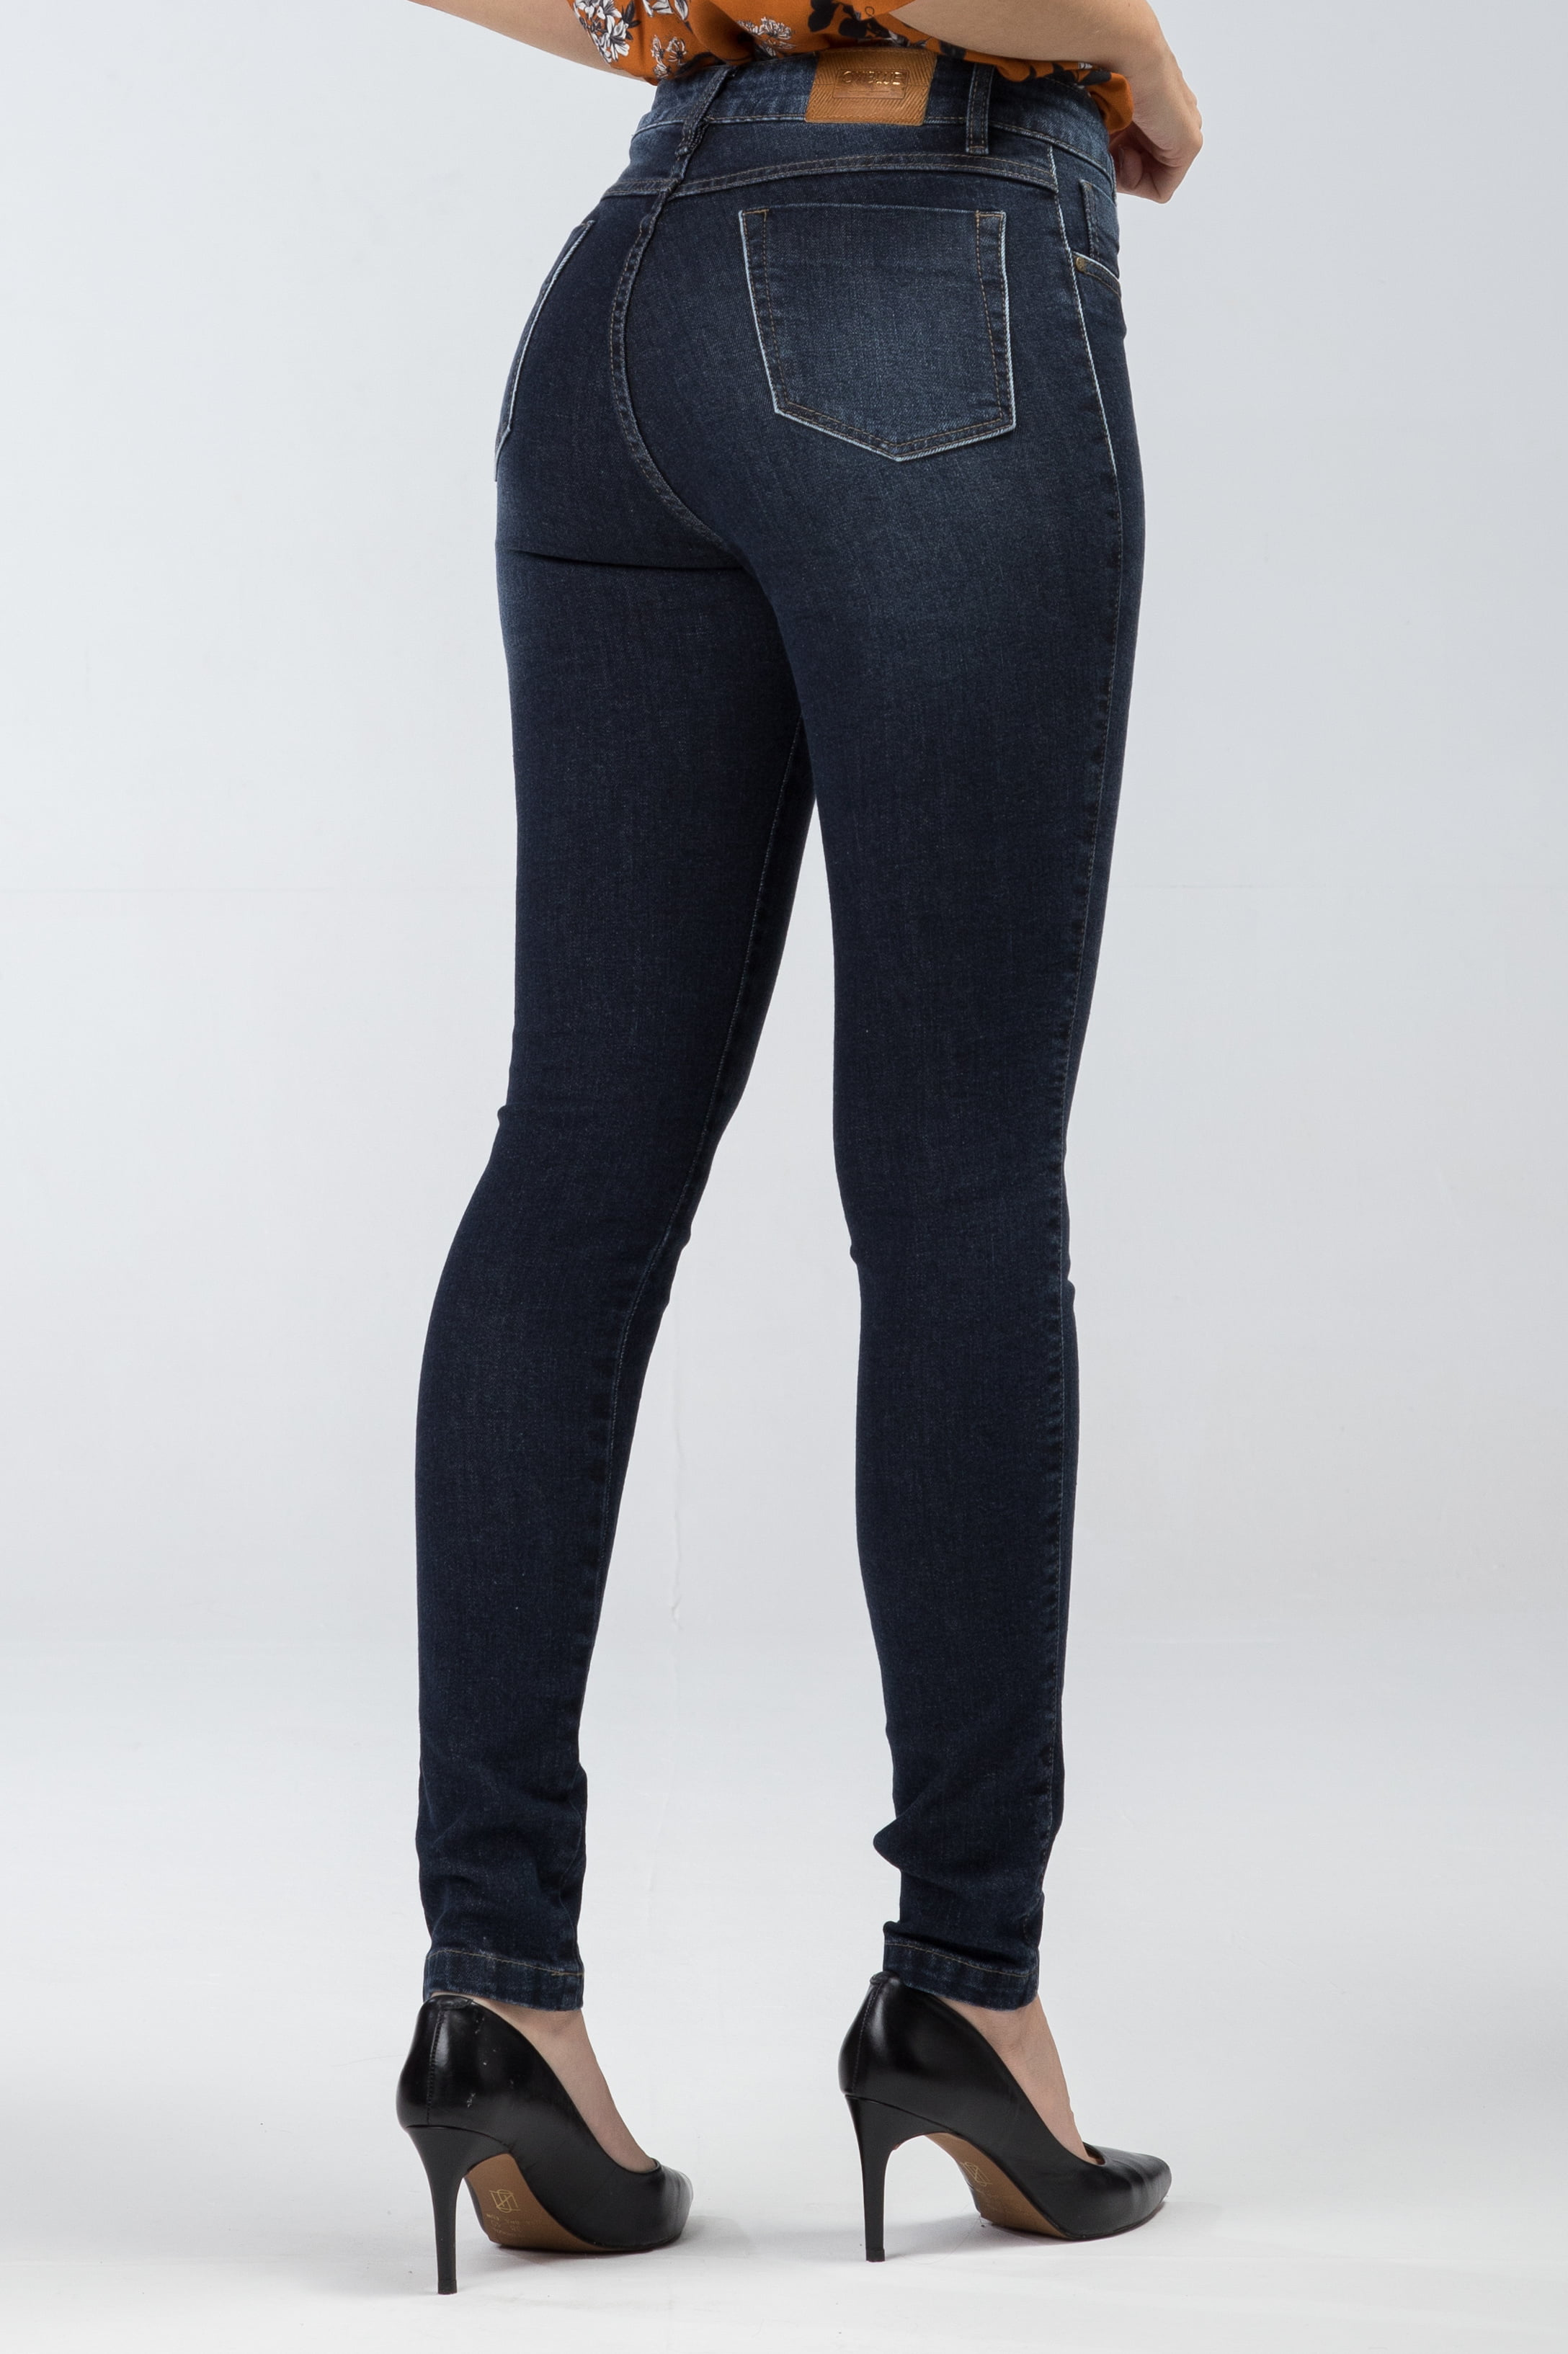 Calça Jeans Skinny Cintura Alta F2020251